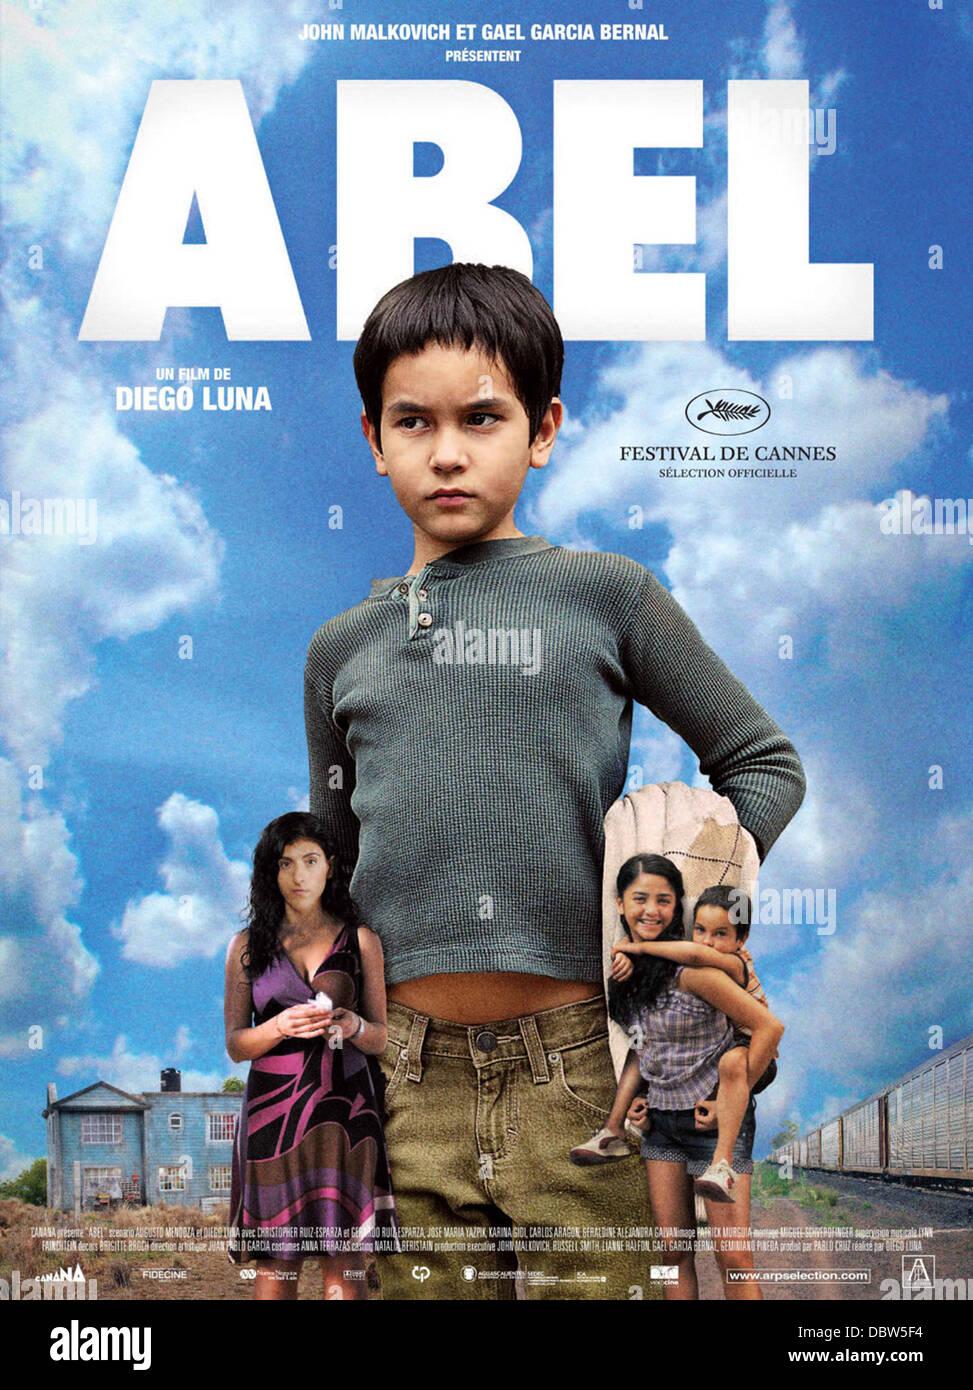 ABEL (POSTER)(2010) DIEGO LUNA (DIR) 002 MOVIESTORE COLLECTION LTD - Stock Image